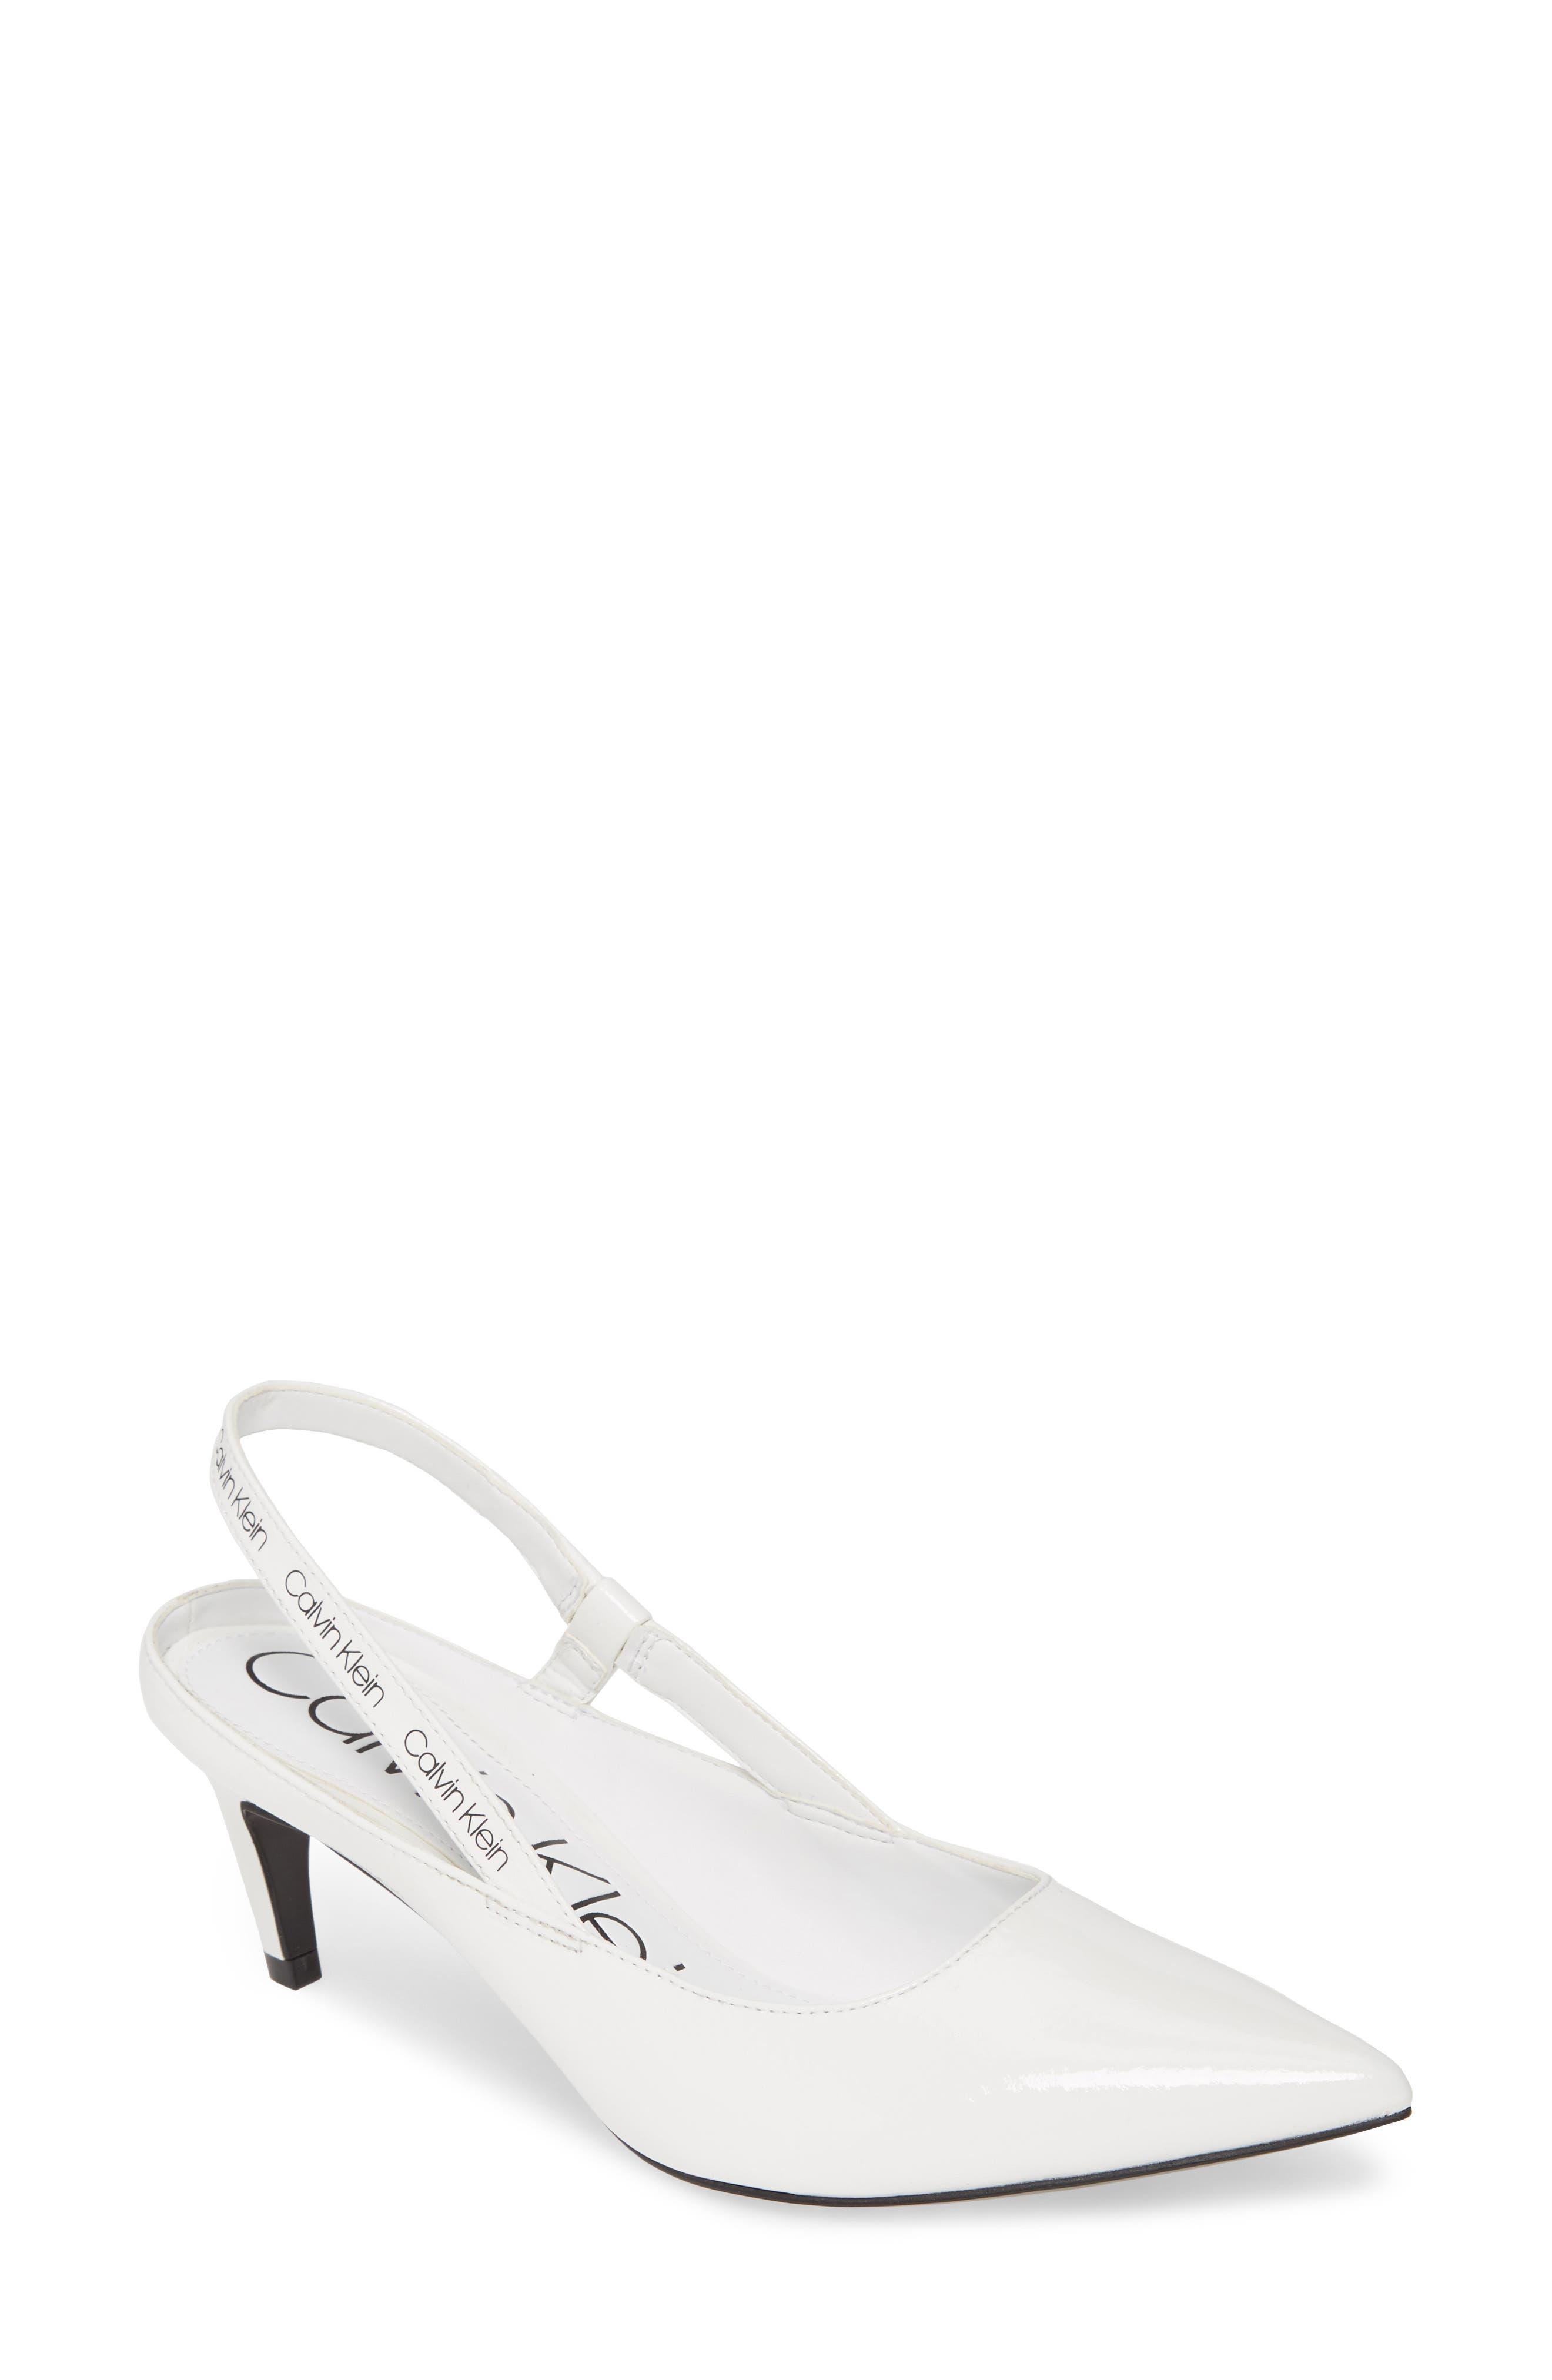 Image of Calvin Klein Greece Slingback Pump